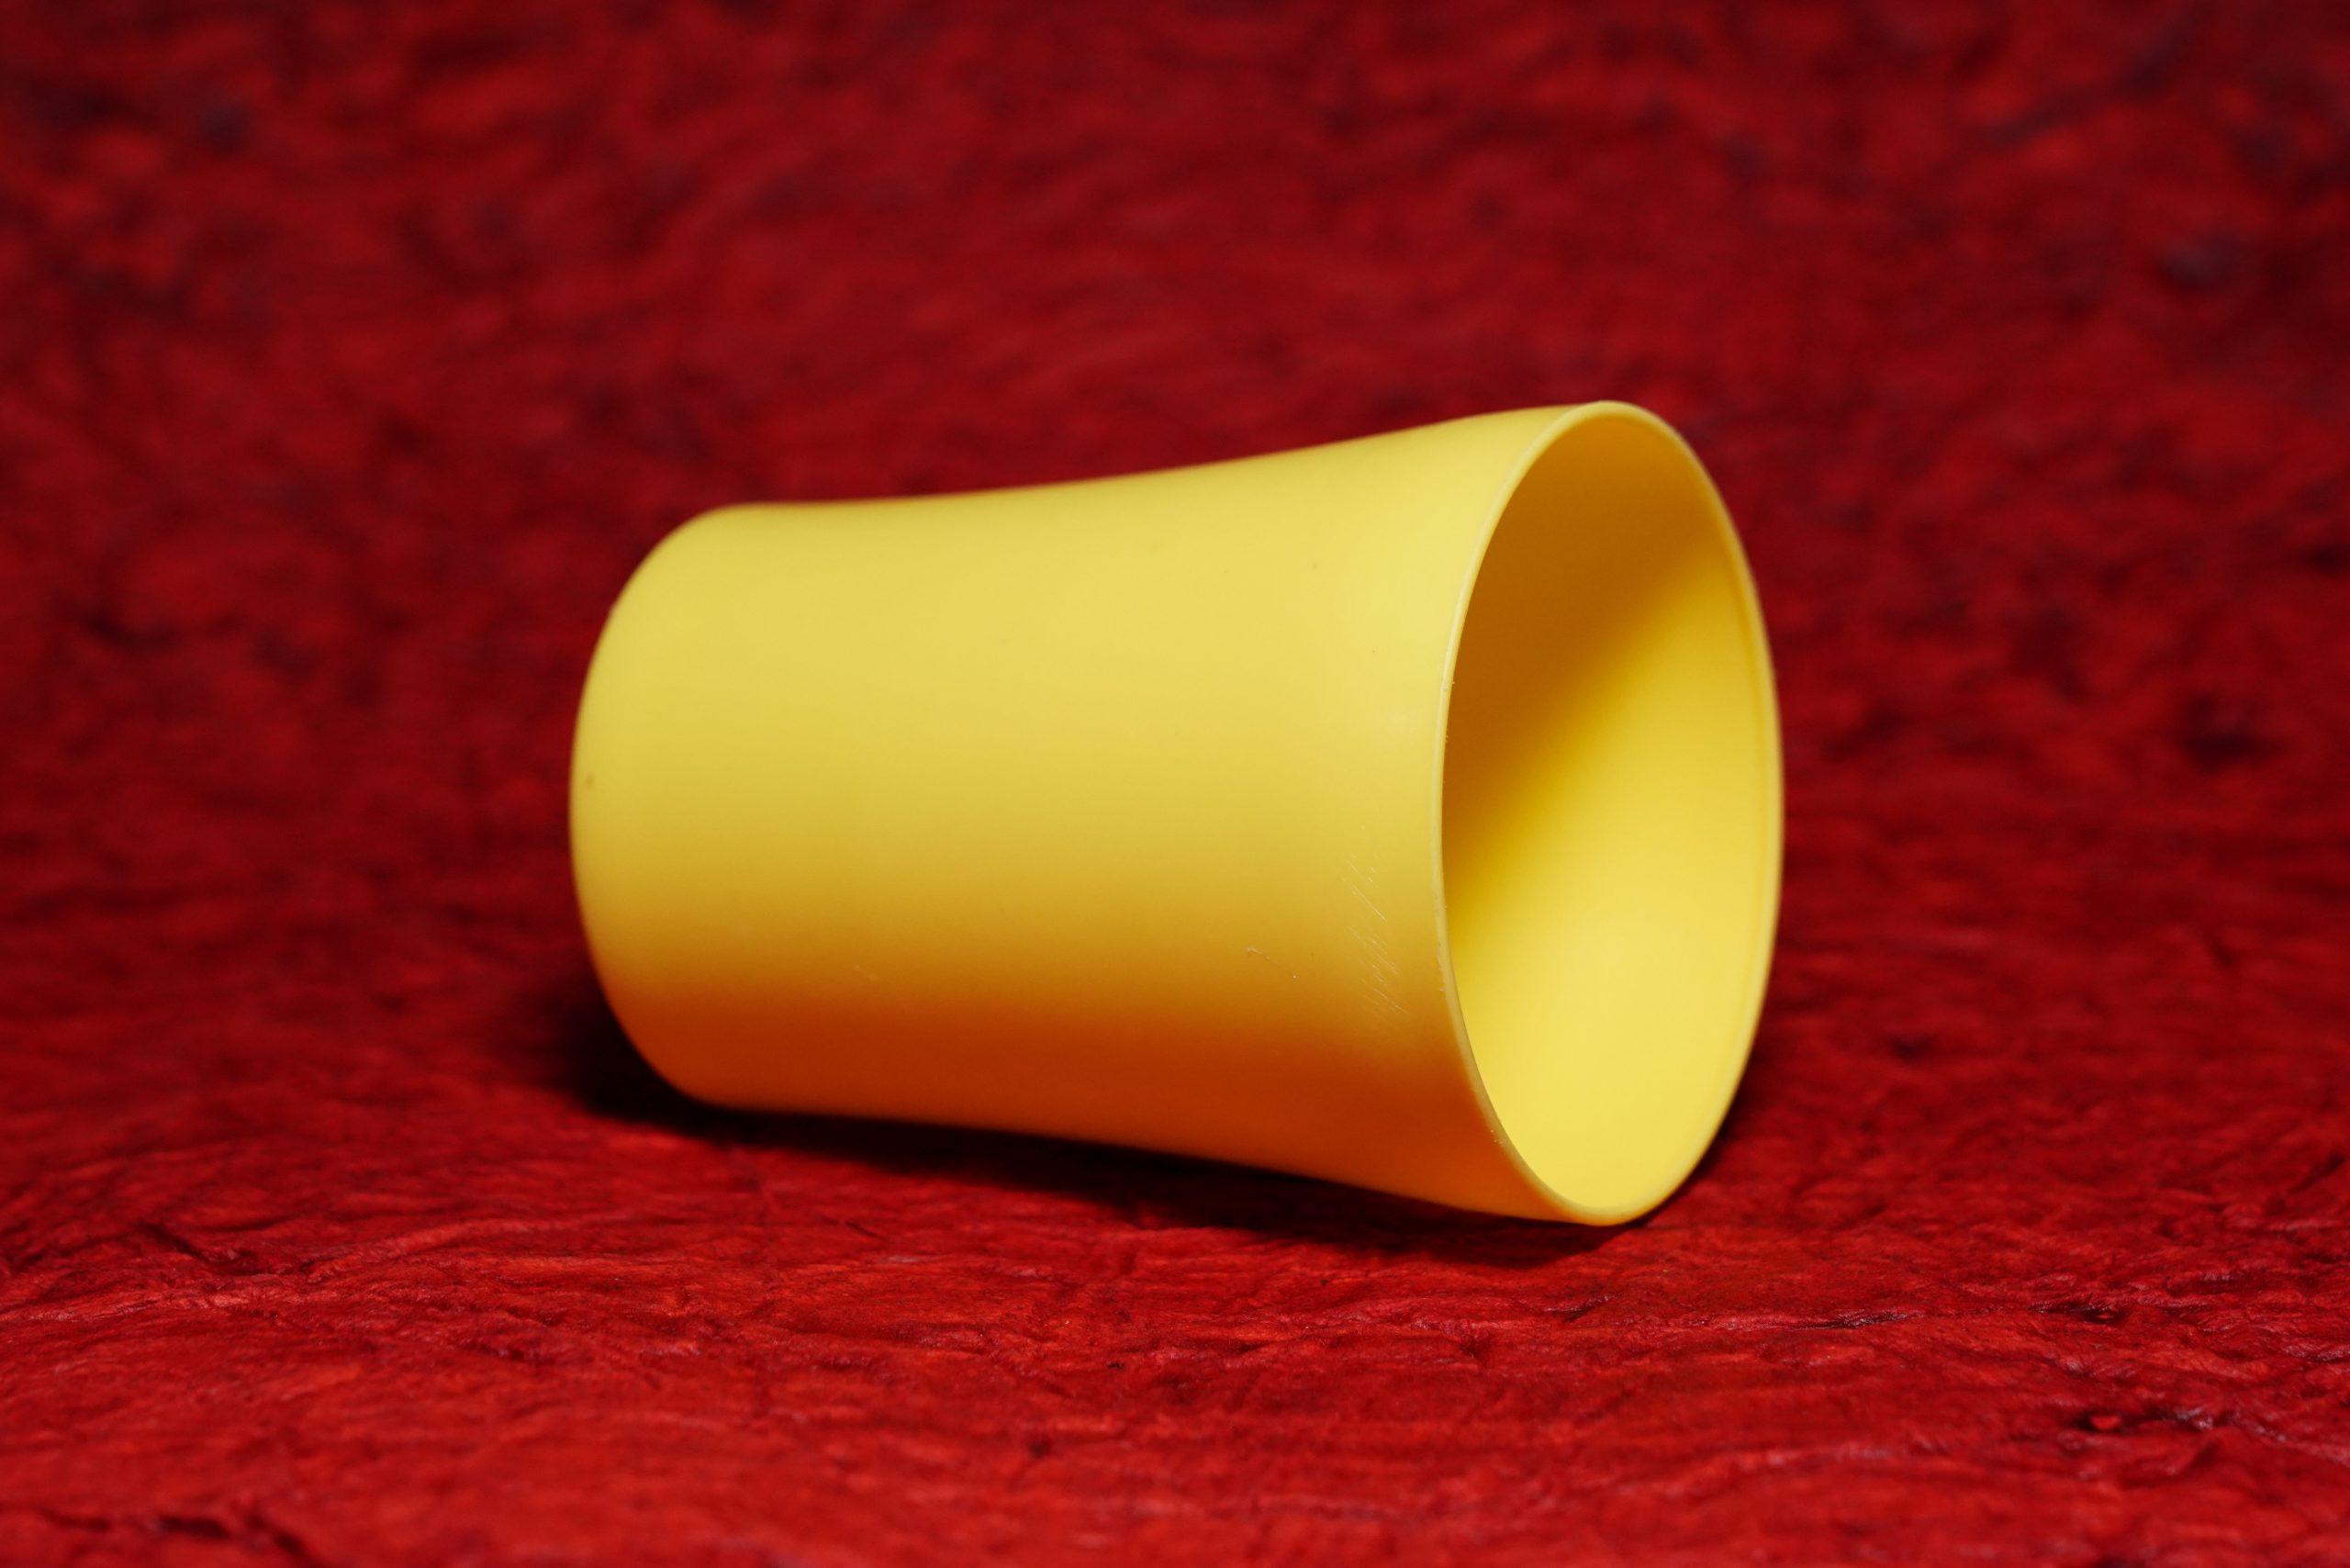 A yellow plastic tumbler